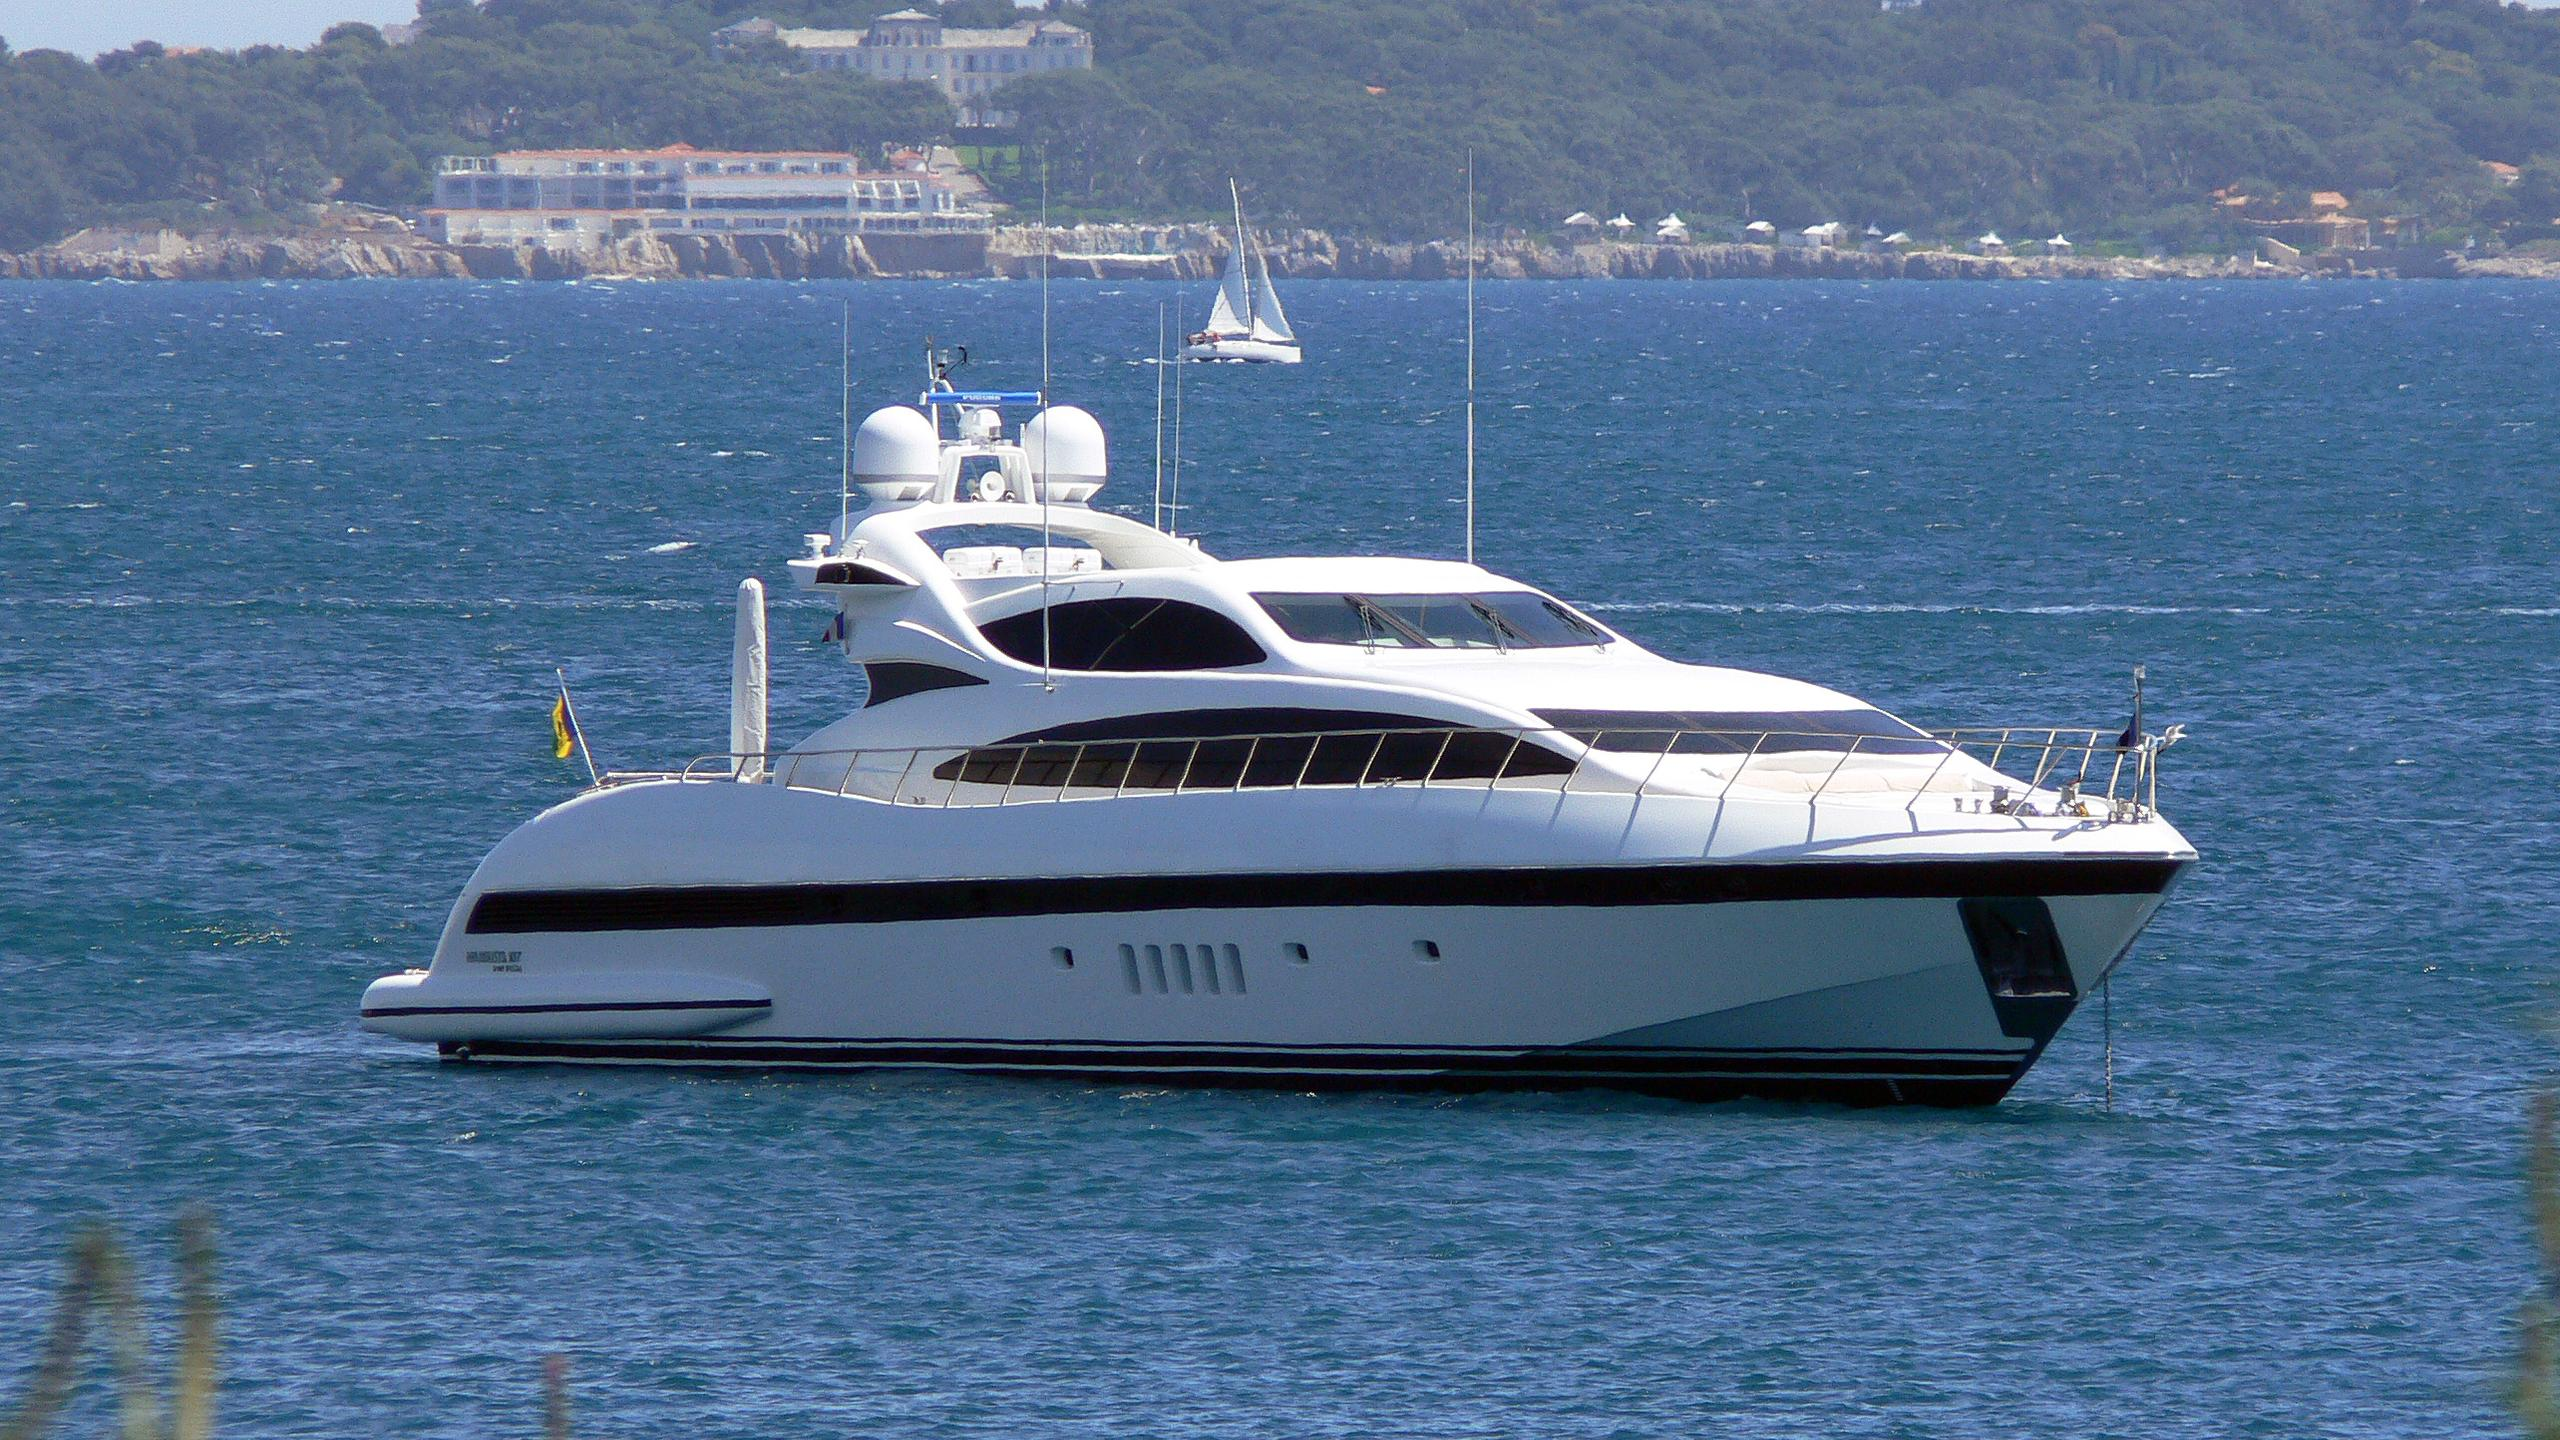 serenada-motor-yacht-overmarine-mangusta-105-2005-31m-half-profile